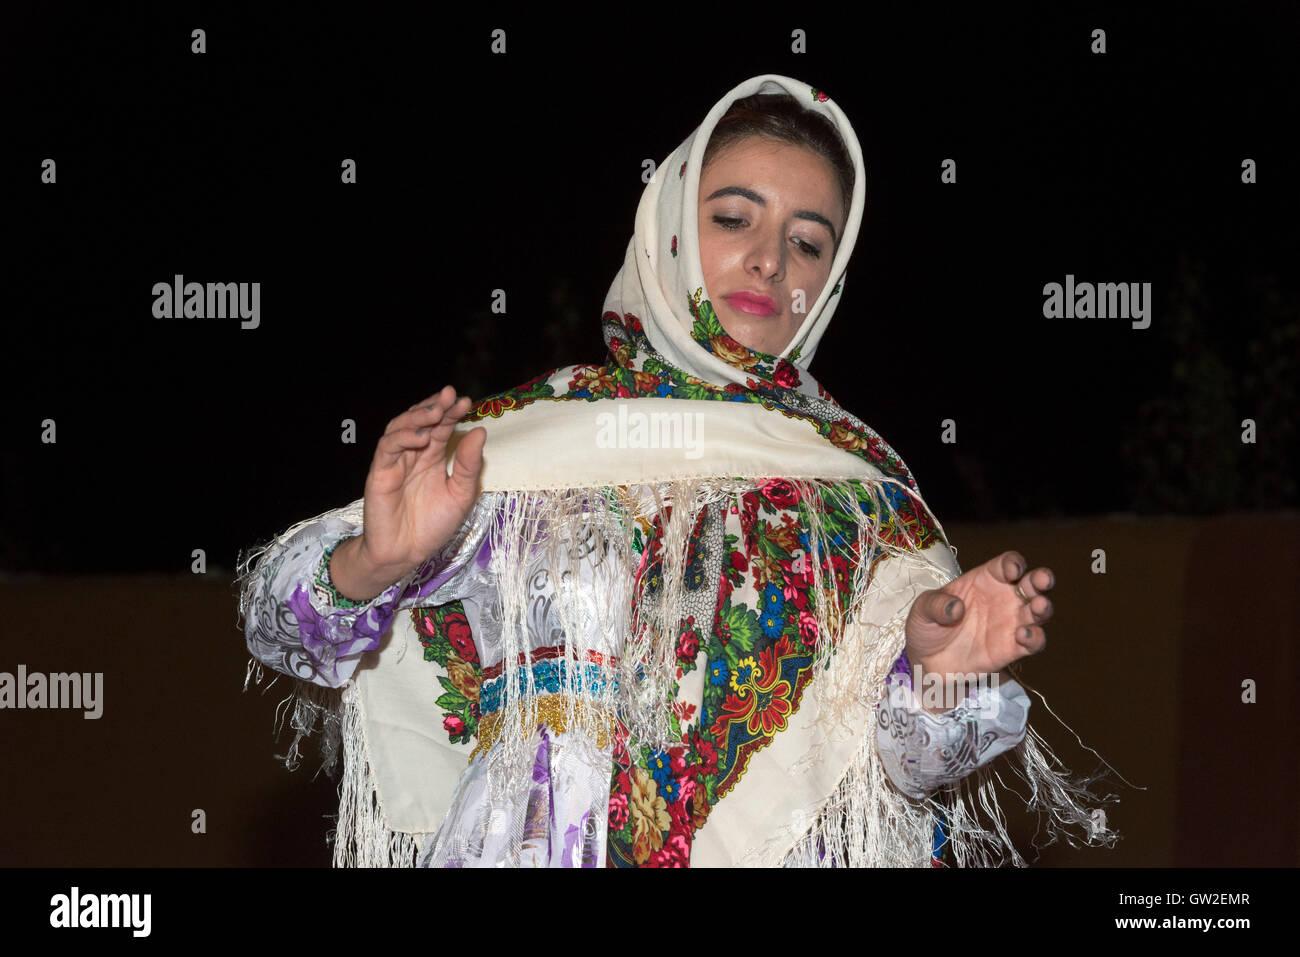 Bojnourd (Bojnurd), Kurdish Wedding, Lady Dancing In Traditional ...